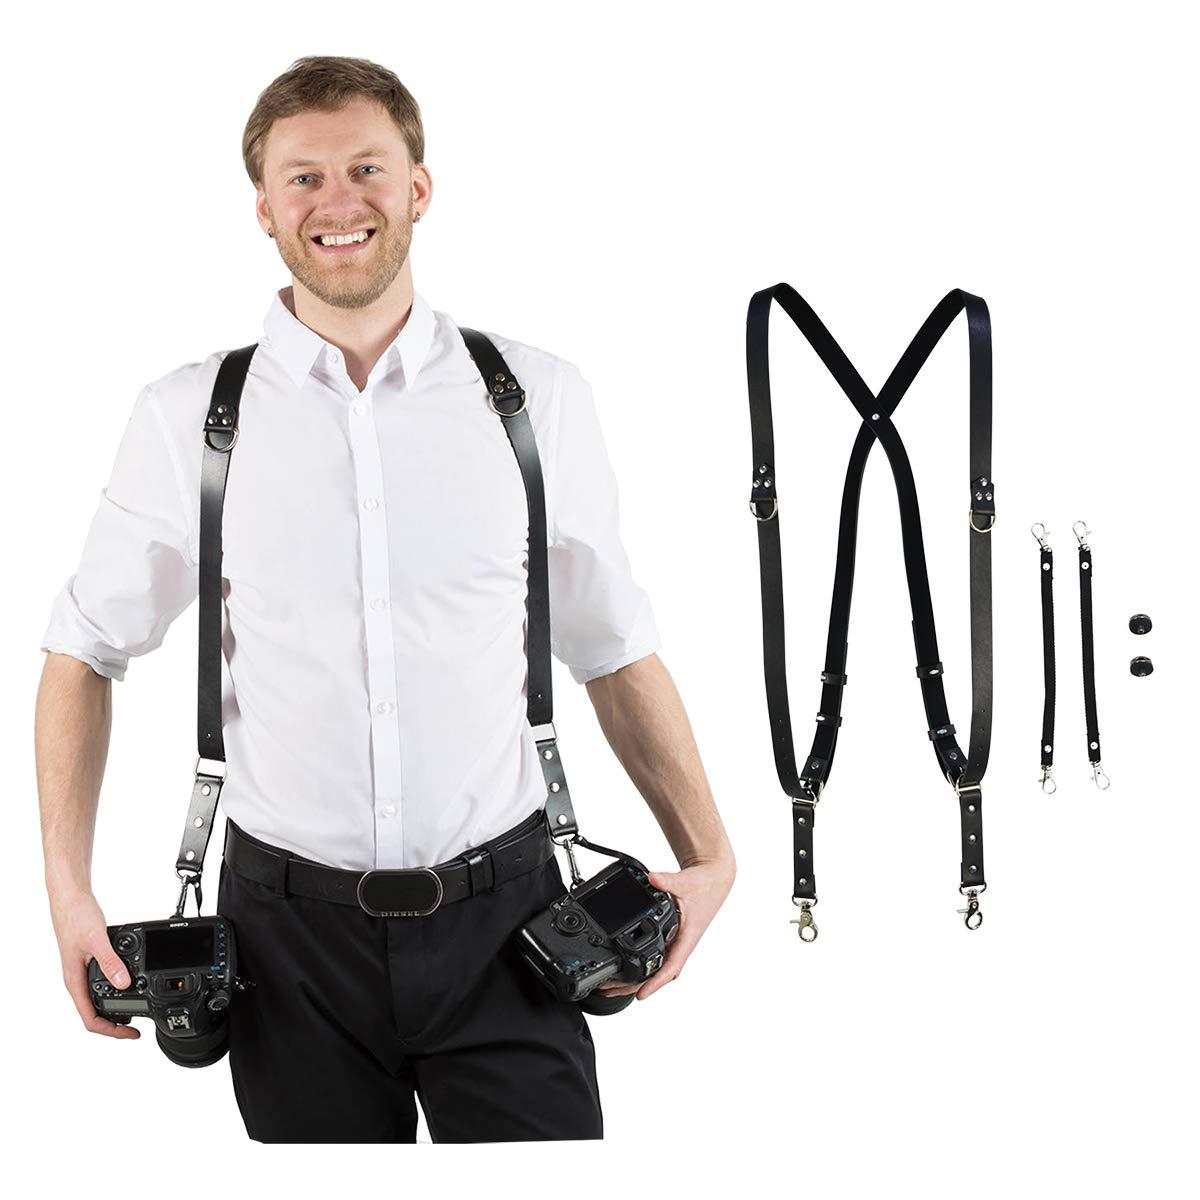 Homelex Adjustable Dual Shoulder Multi Camera Leather Harness Strap Sling Accessories